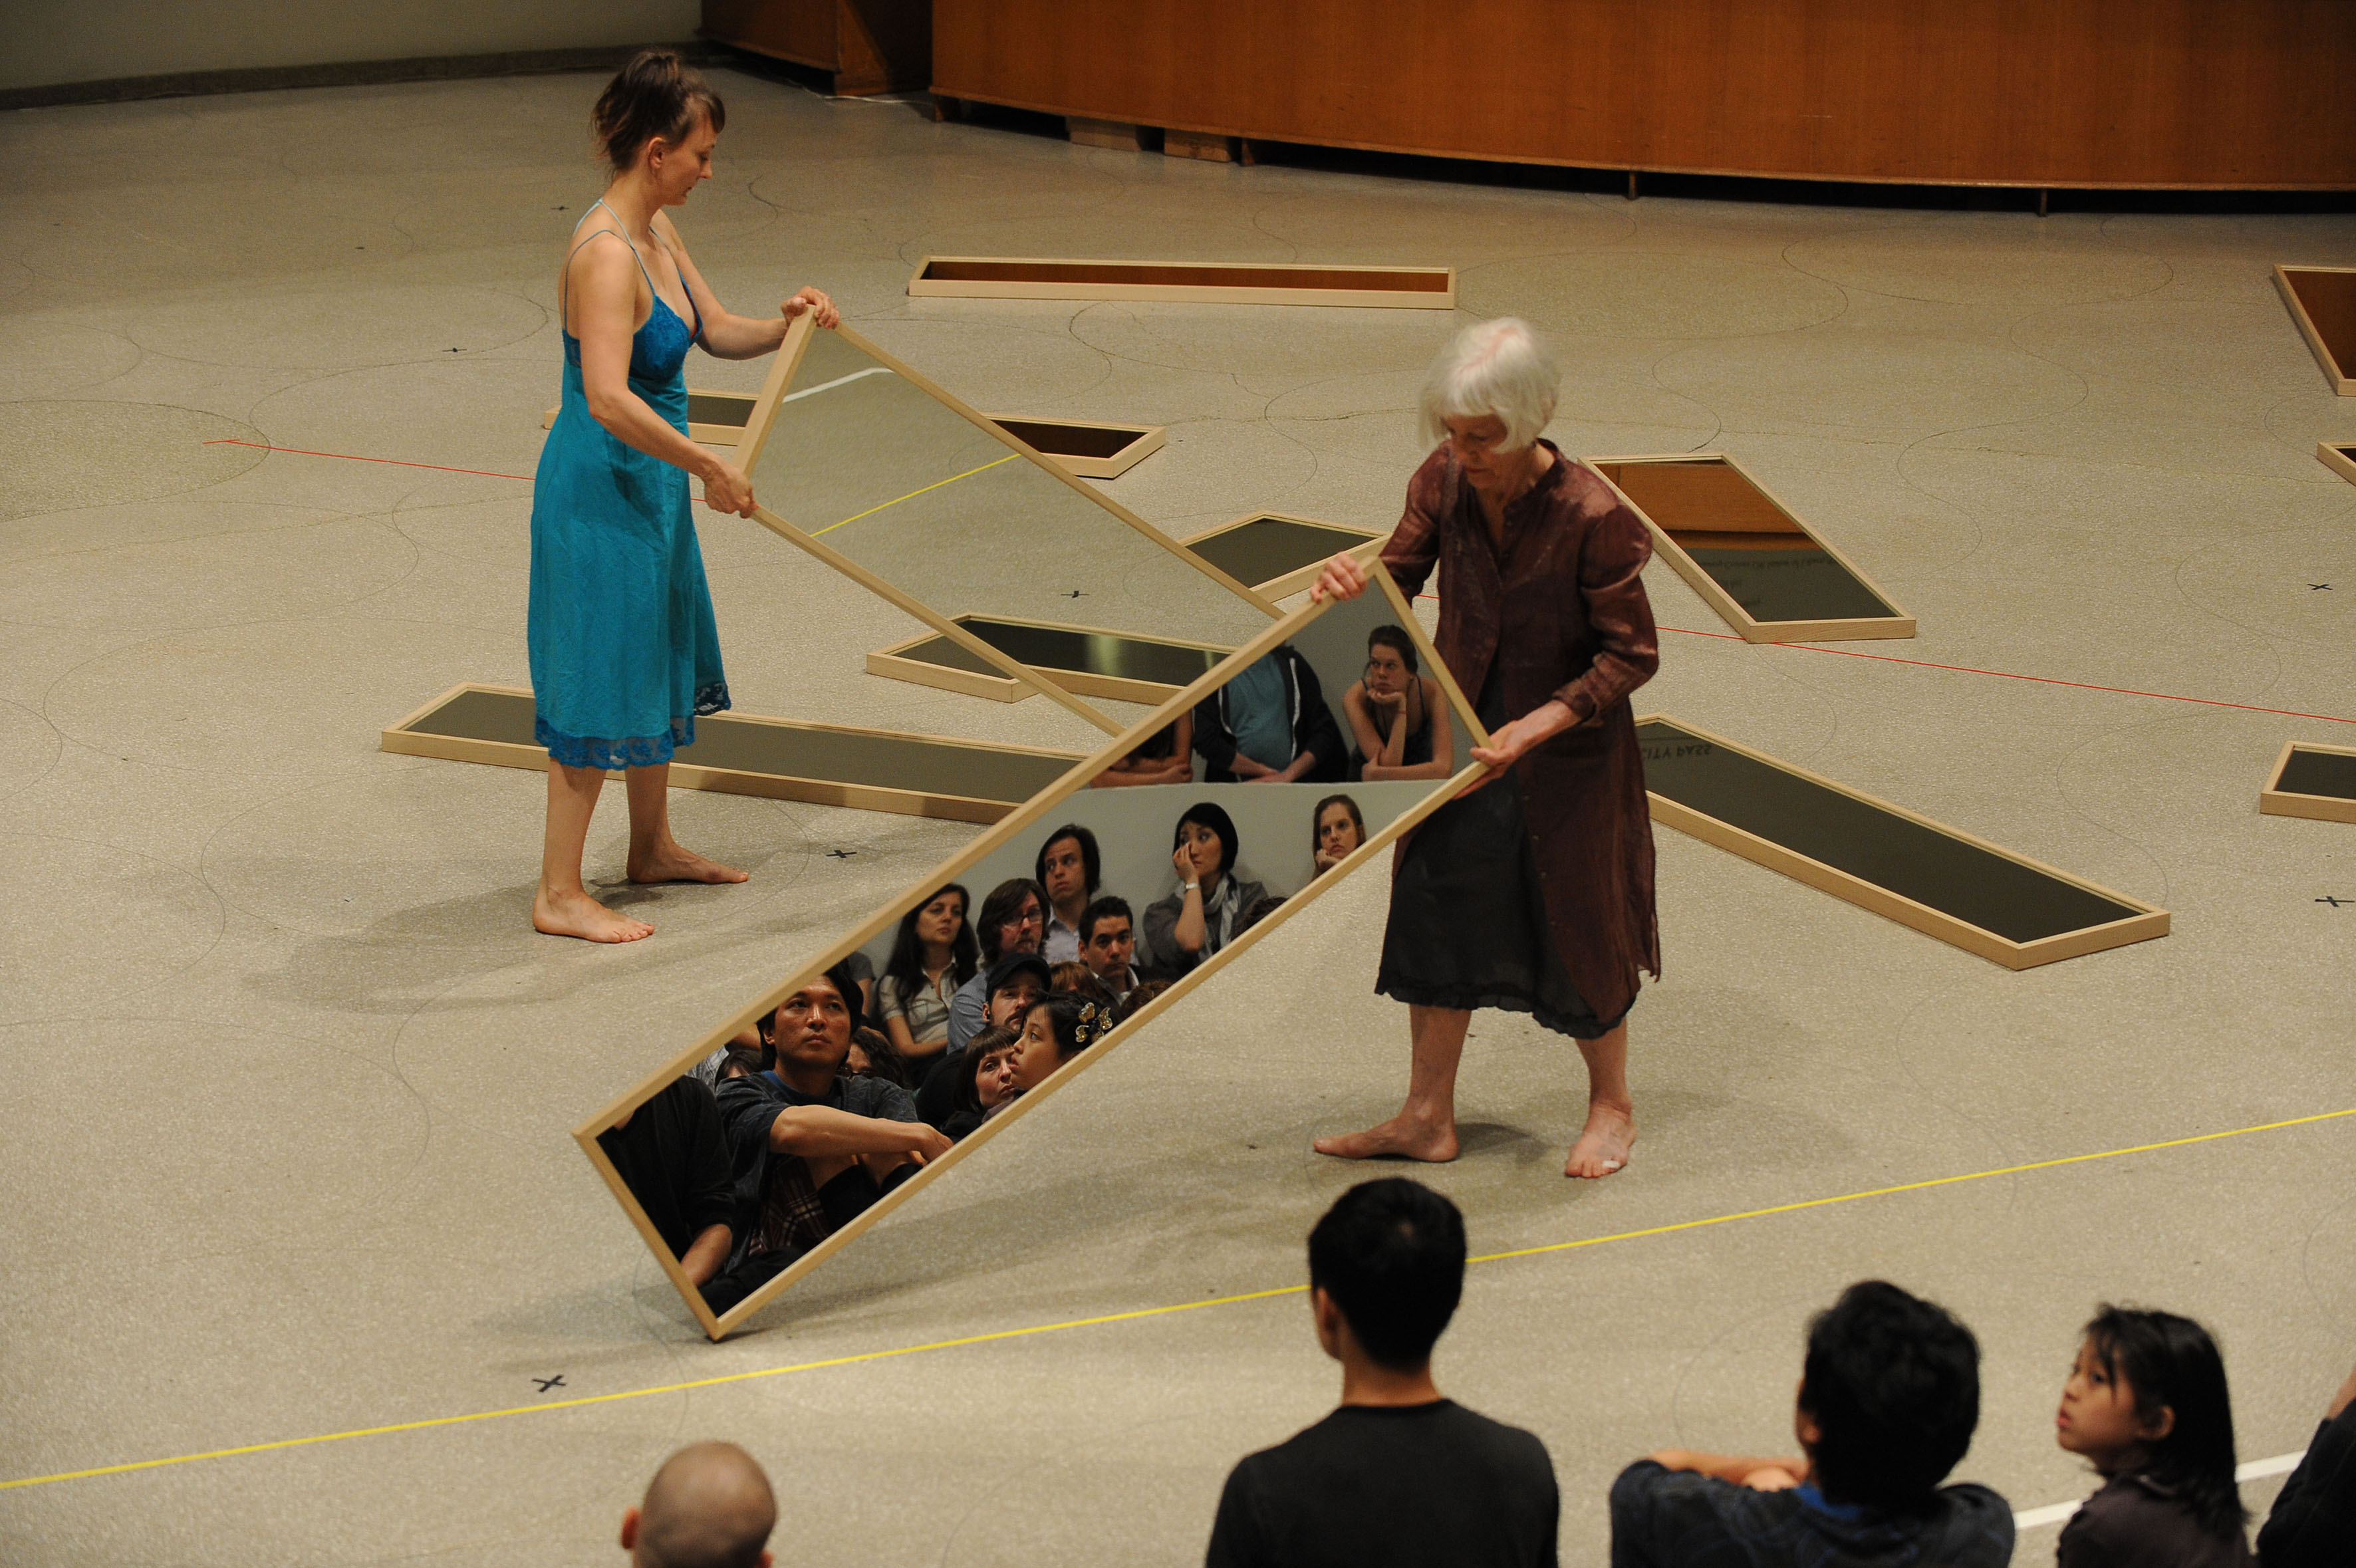 Joan Jonas, Mirror Piece I Reconfigured (1969/2010), Performance: The Guggenheim Museum, New York, 2010, Photo: Enid Alvares, Courtesy the artist